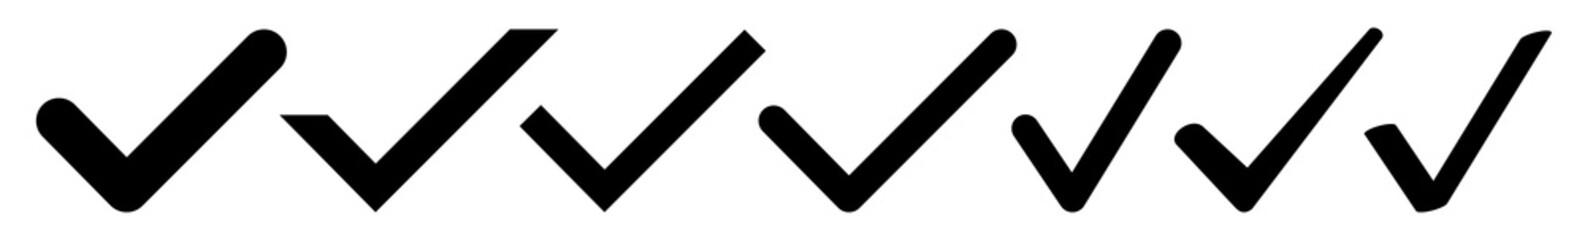 Check Mark Icon Black | Checkmark Illustration | Tick Symbol | Voting Logo | Approved Sign | Isolated | Variations Fototapete